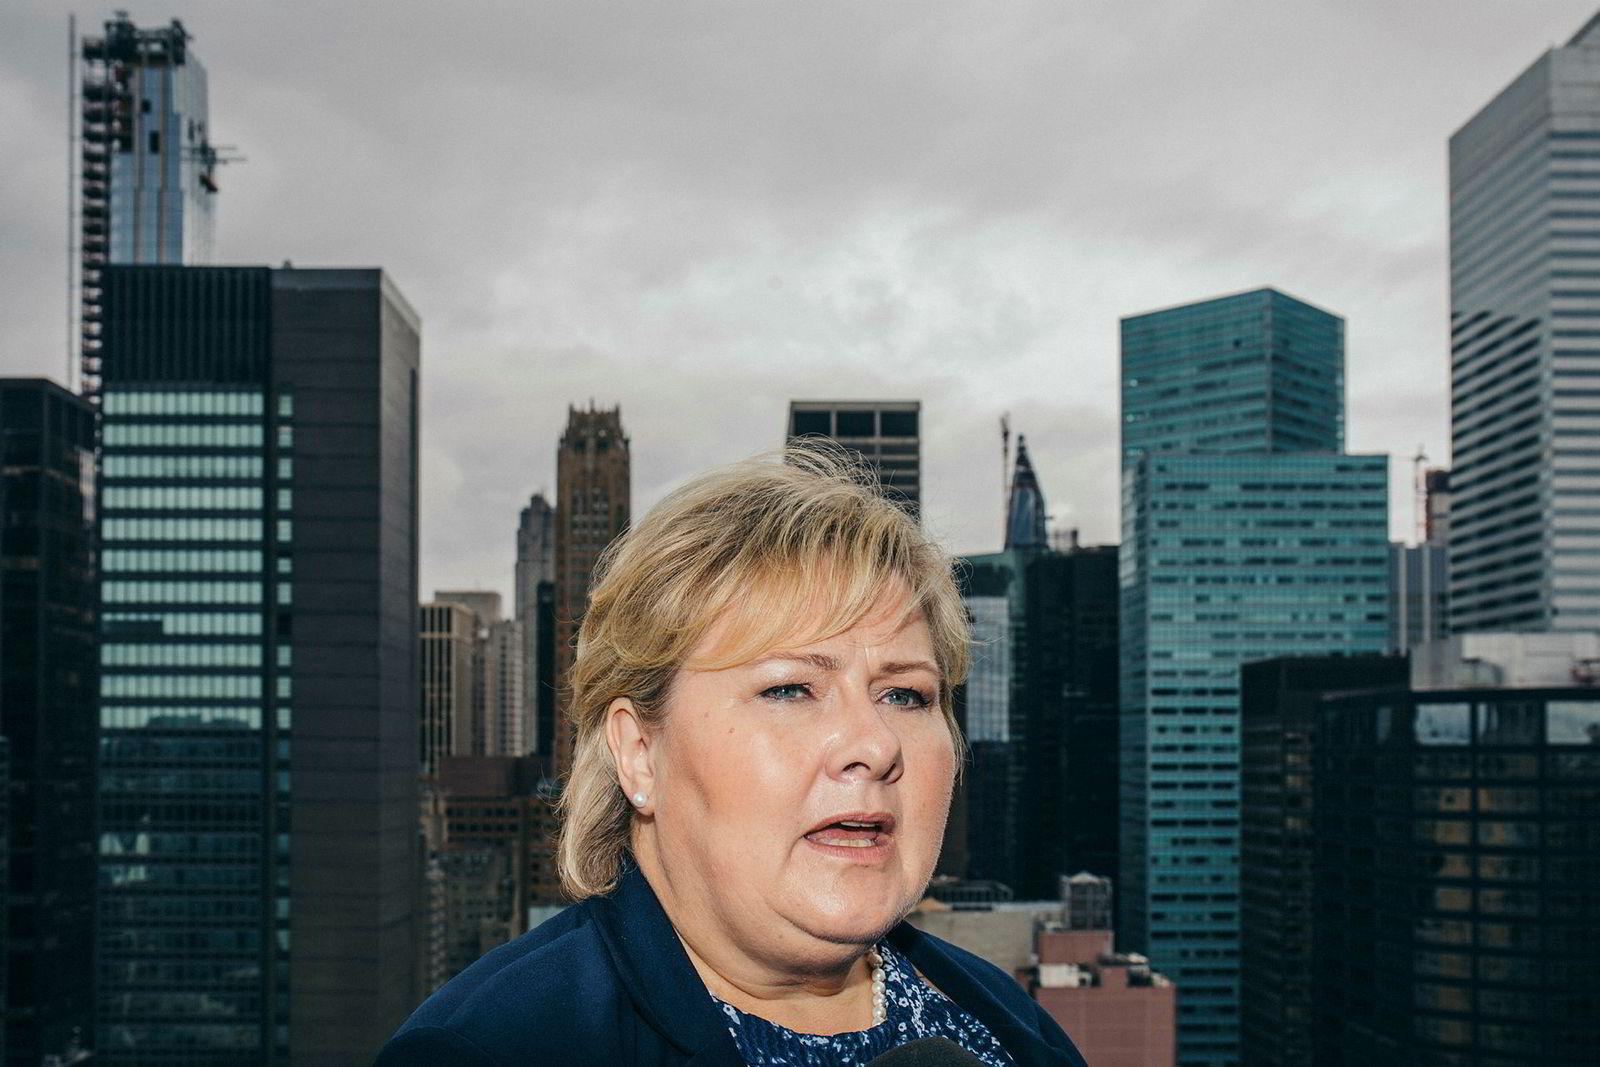 Statsminister Erna Solberg tror høstens mellomvalg i Kongressen i Washington, D.C også kan få følger for handelspolitikken. Her på balkongen til til Norges FN-ambassadør, Tore Hattrem.